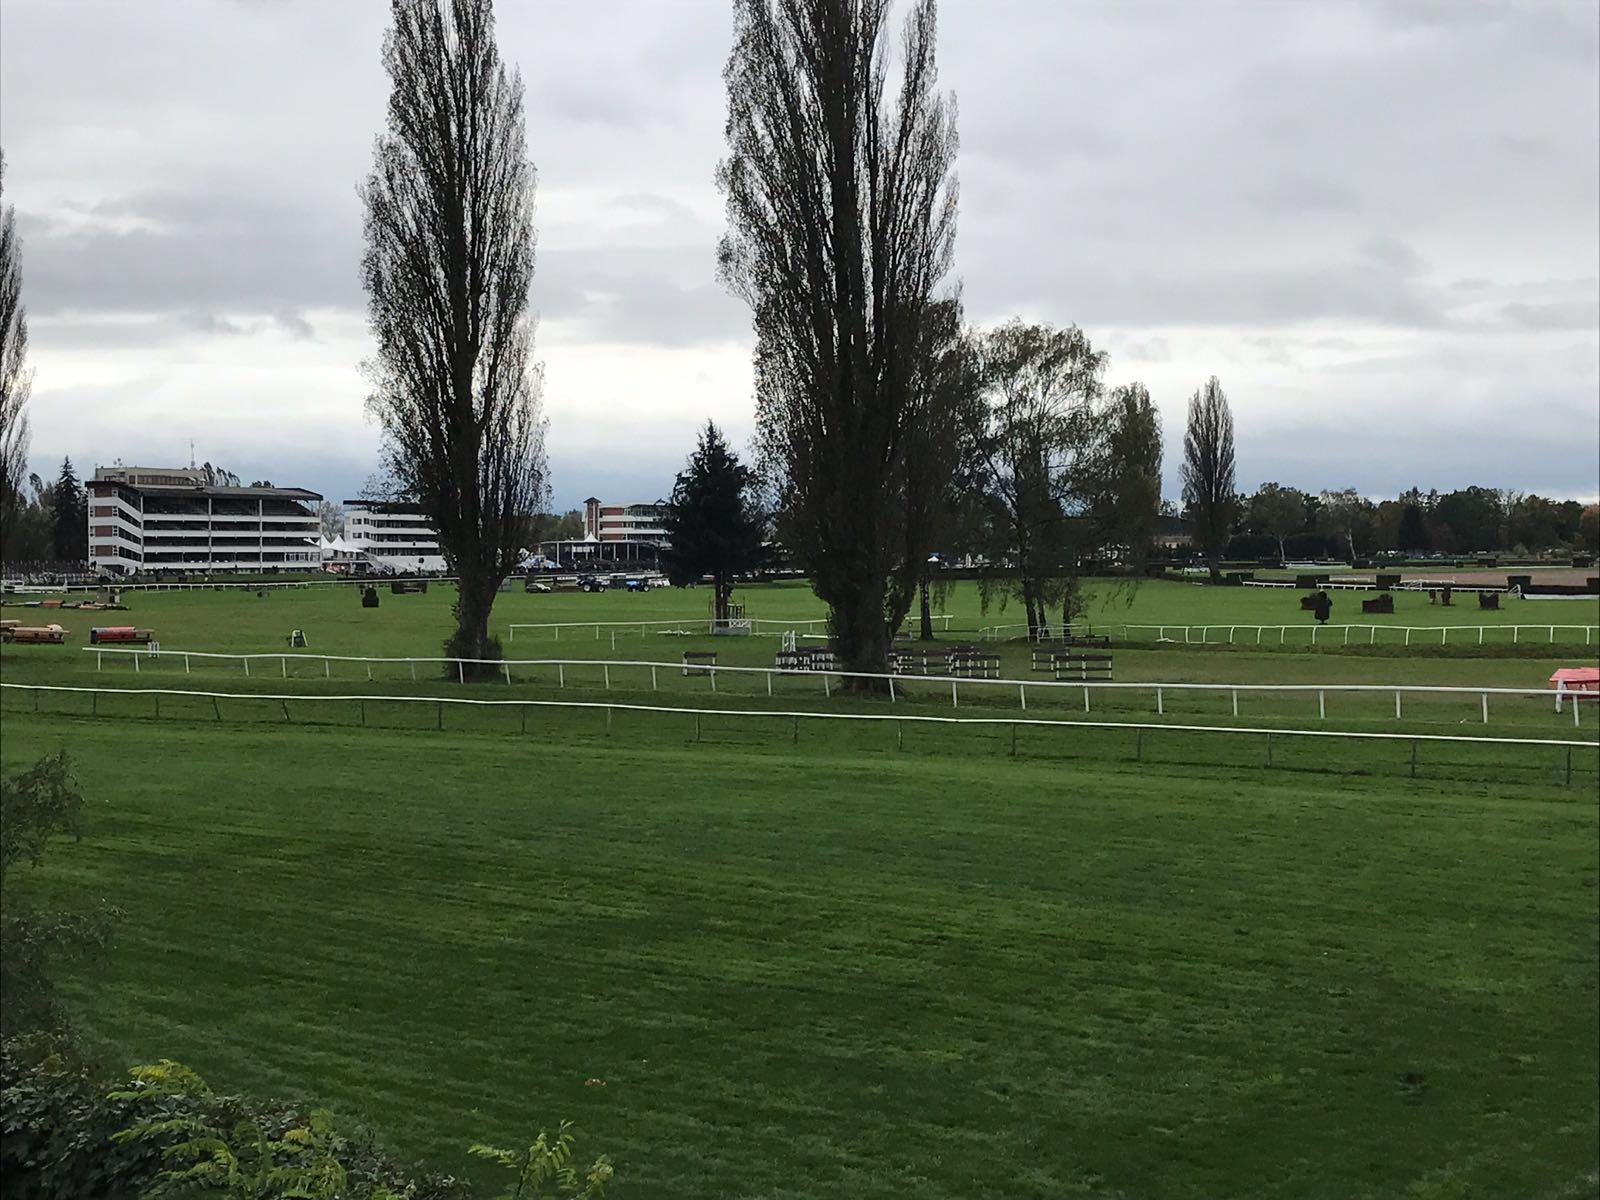 The view as you walk towards the racecourse